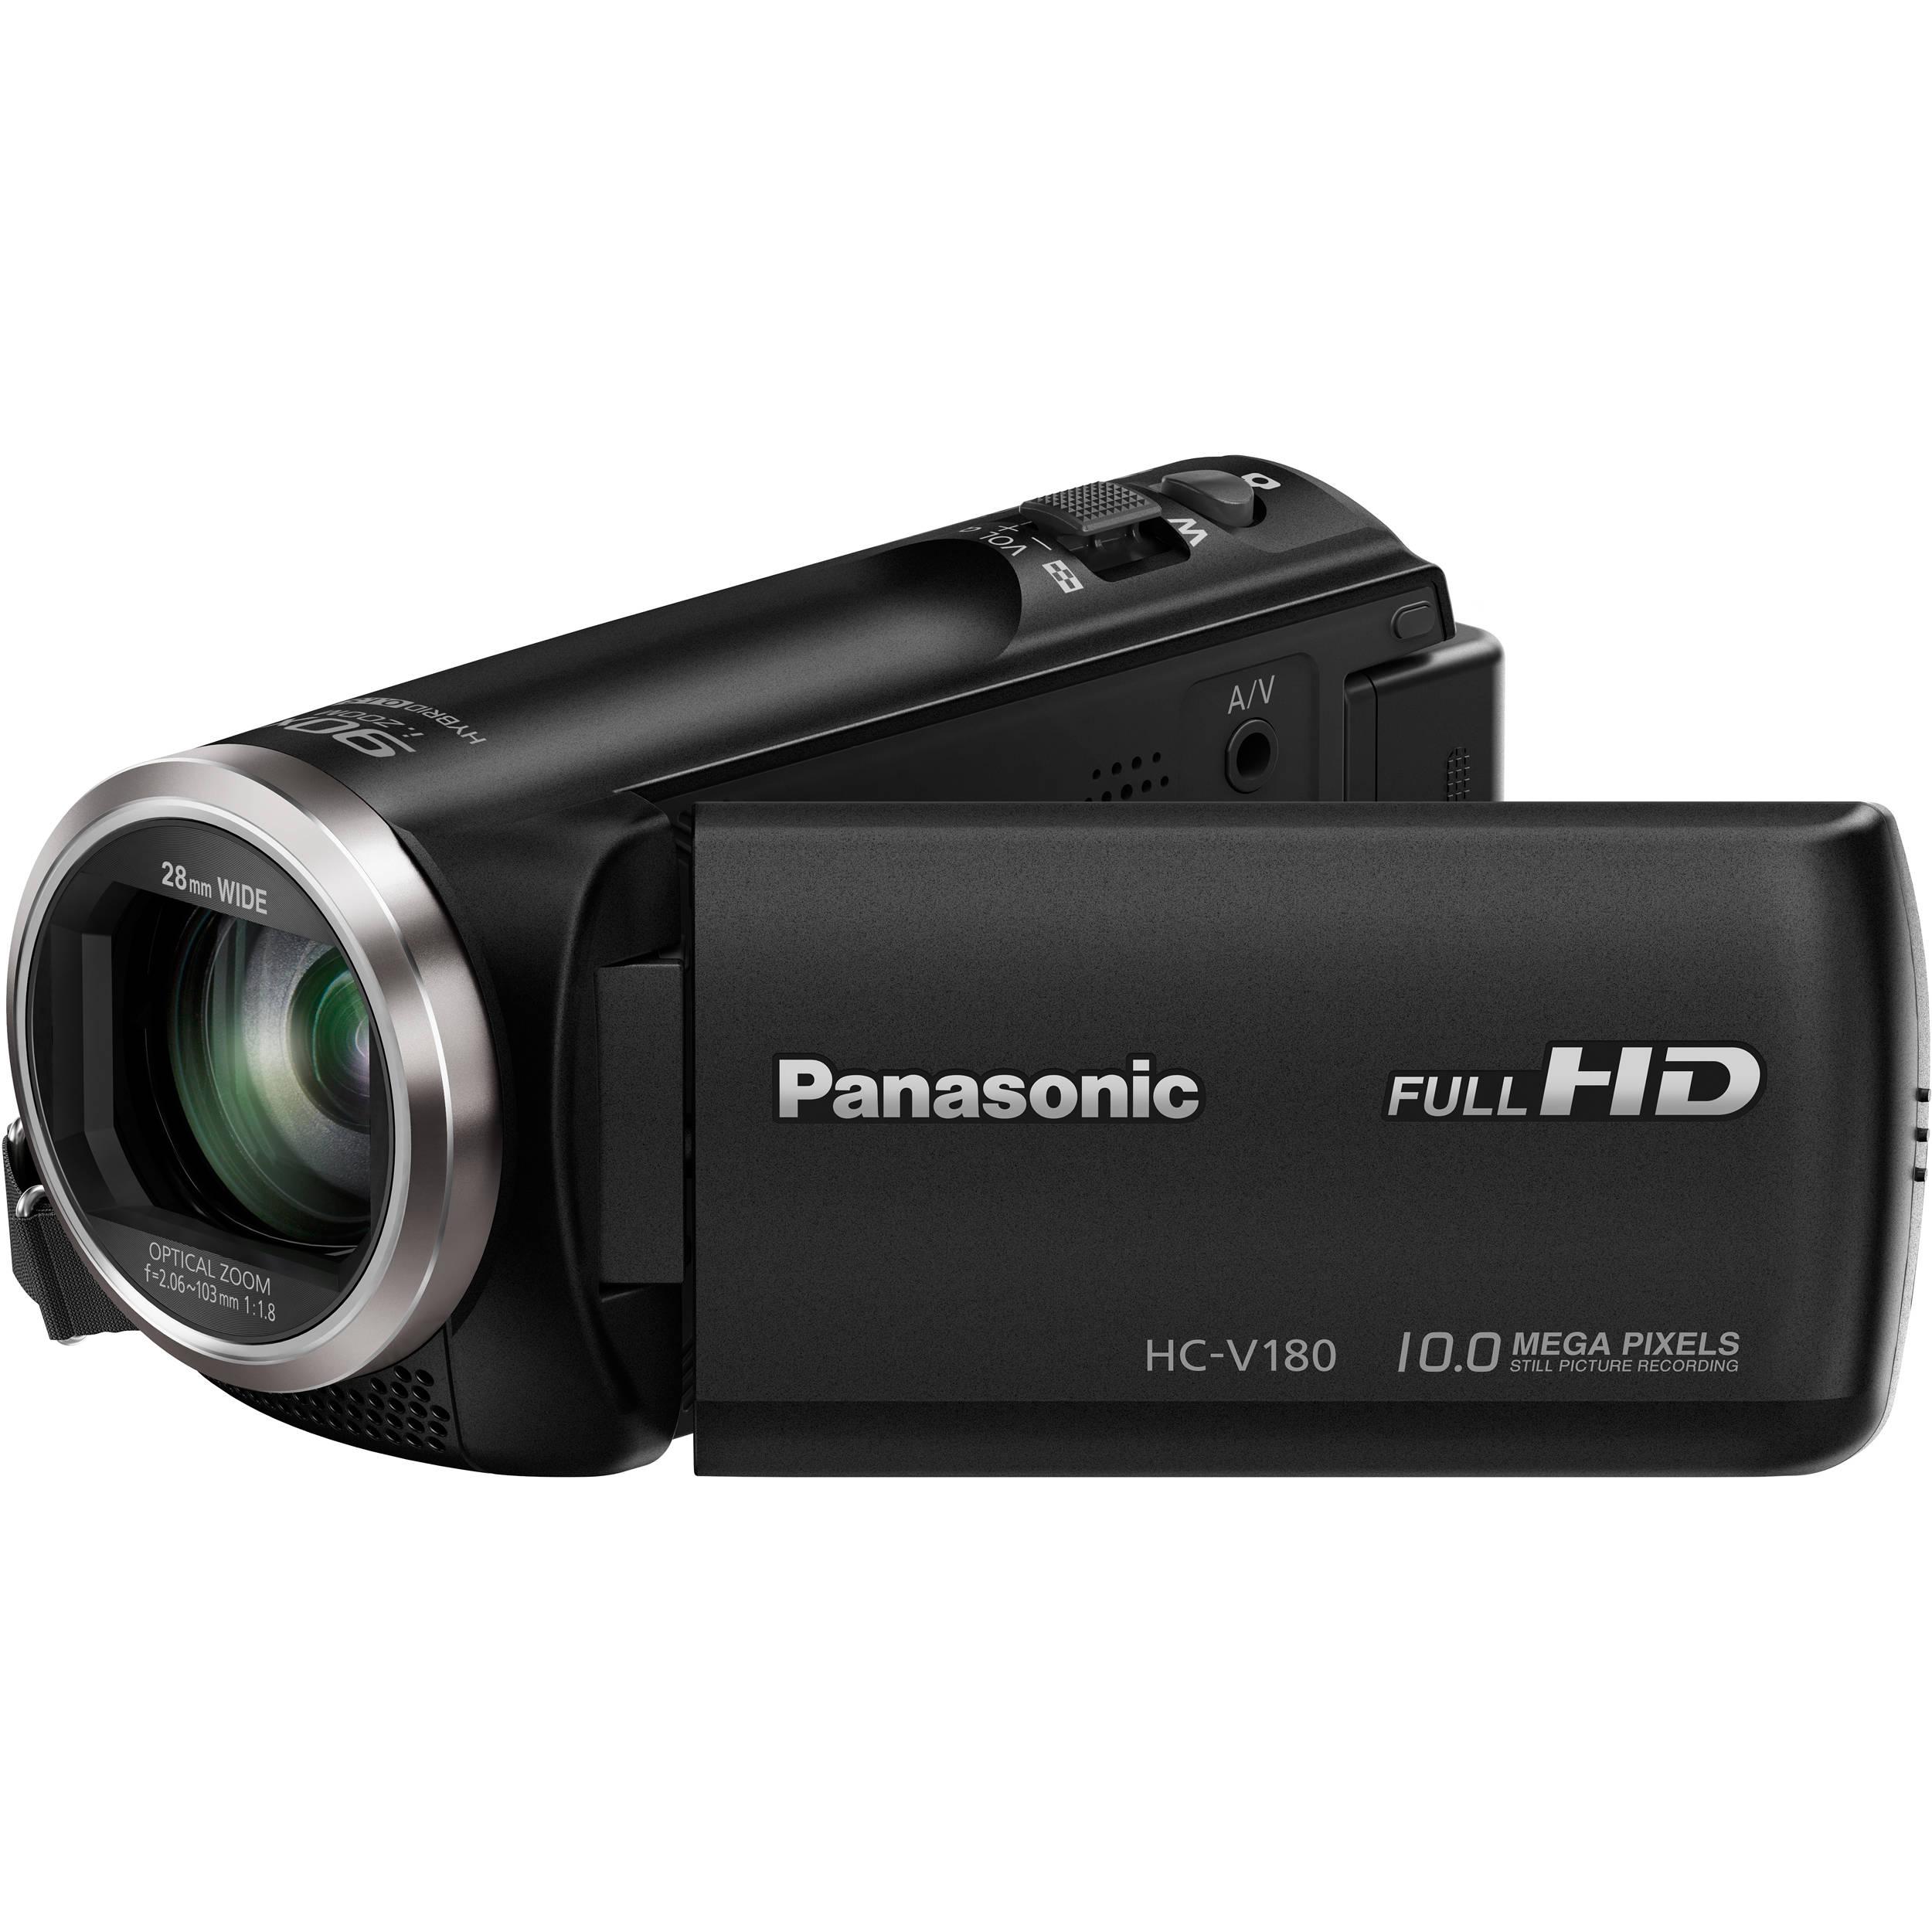 panasonic hc v180k full hd camcorder black hc v180k b h photo rh bhphotovideo com Panasonic Professional Camcorders Panasonic Mini DV Digital Camcorder